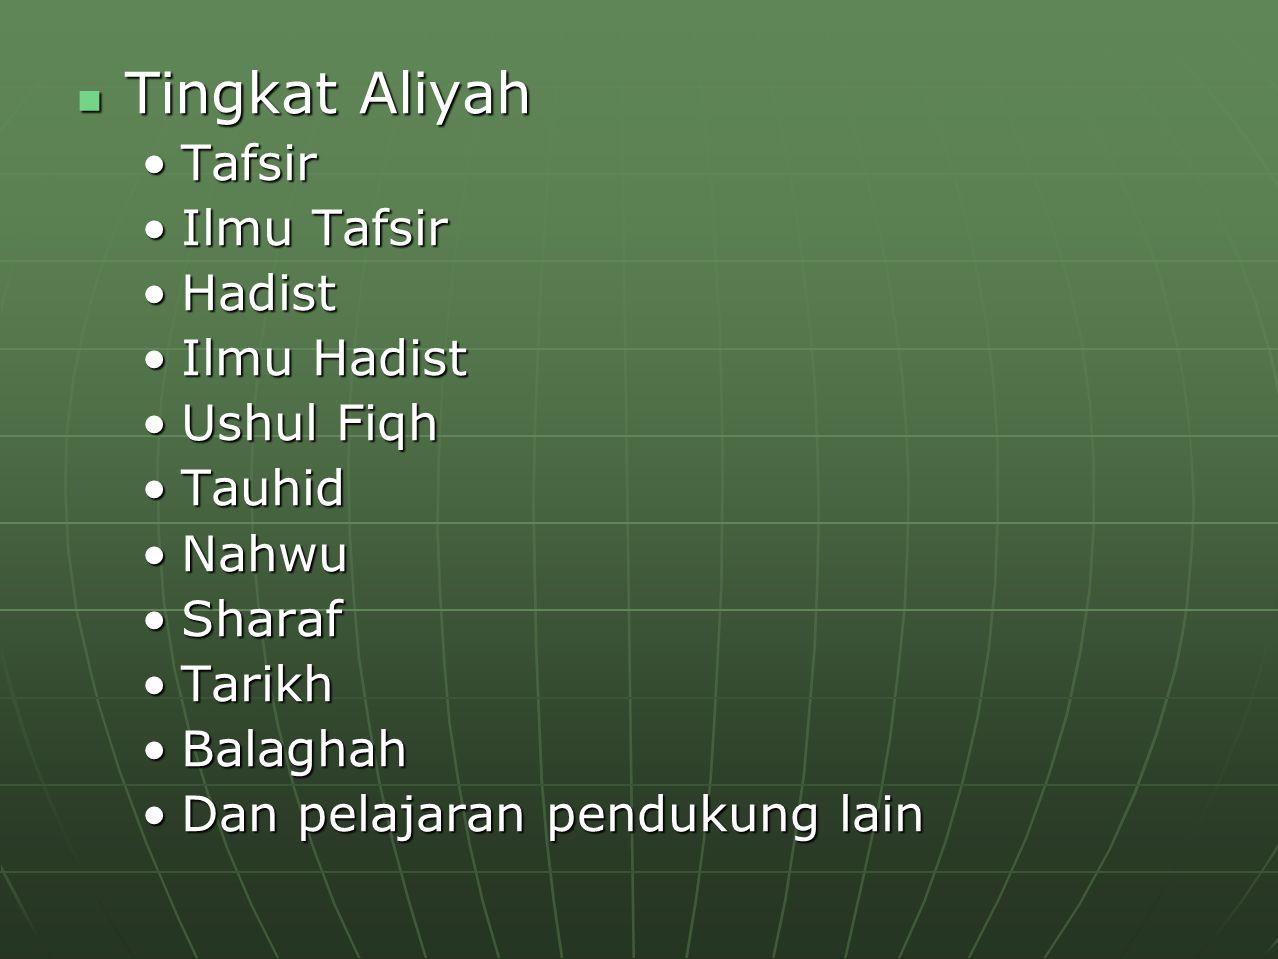 Tingkat Aliyah Tafsir Ilmu Tafsir Hadist Ilmu Hadist Ushul Fiqh Tauhid